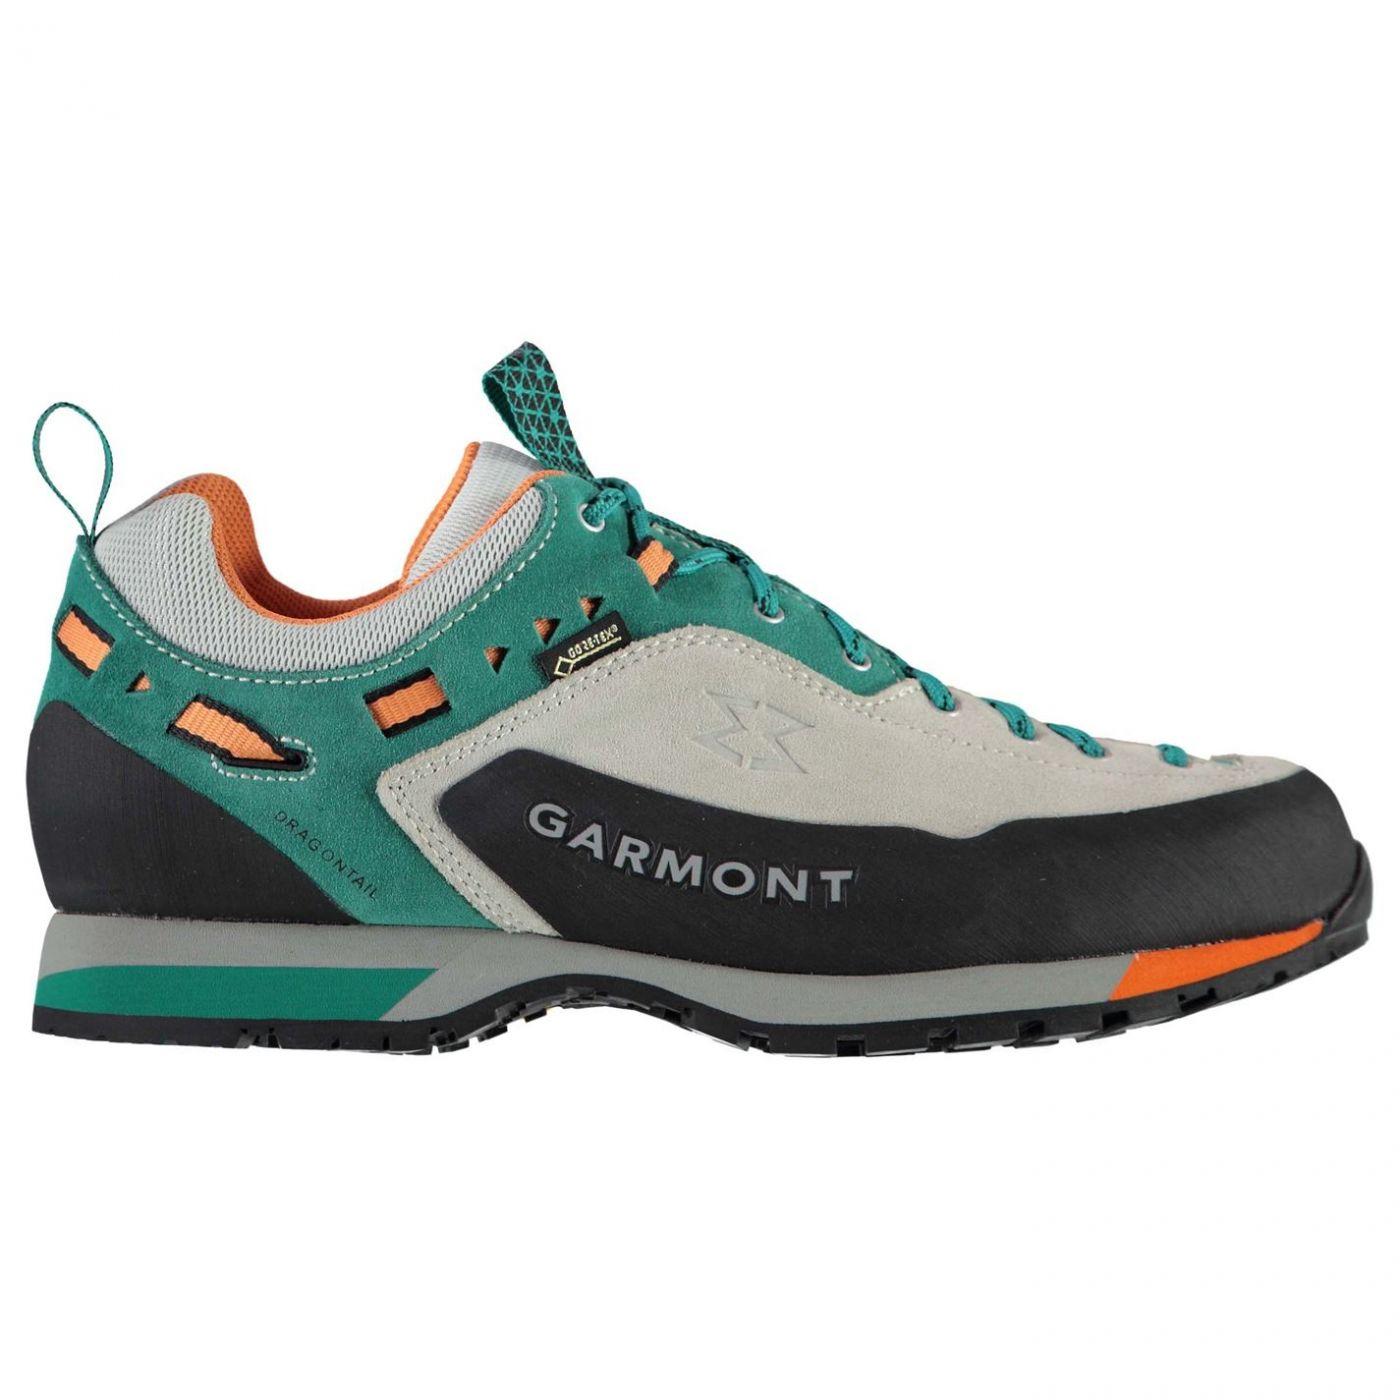 Garmont Dragontail GTX Walking Shoes Ladies